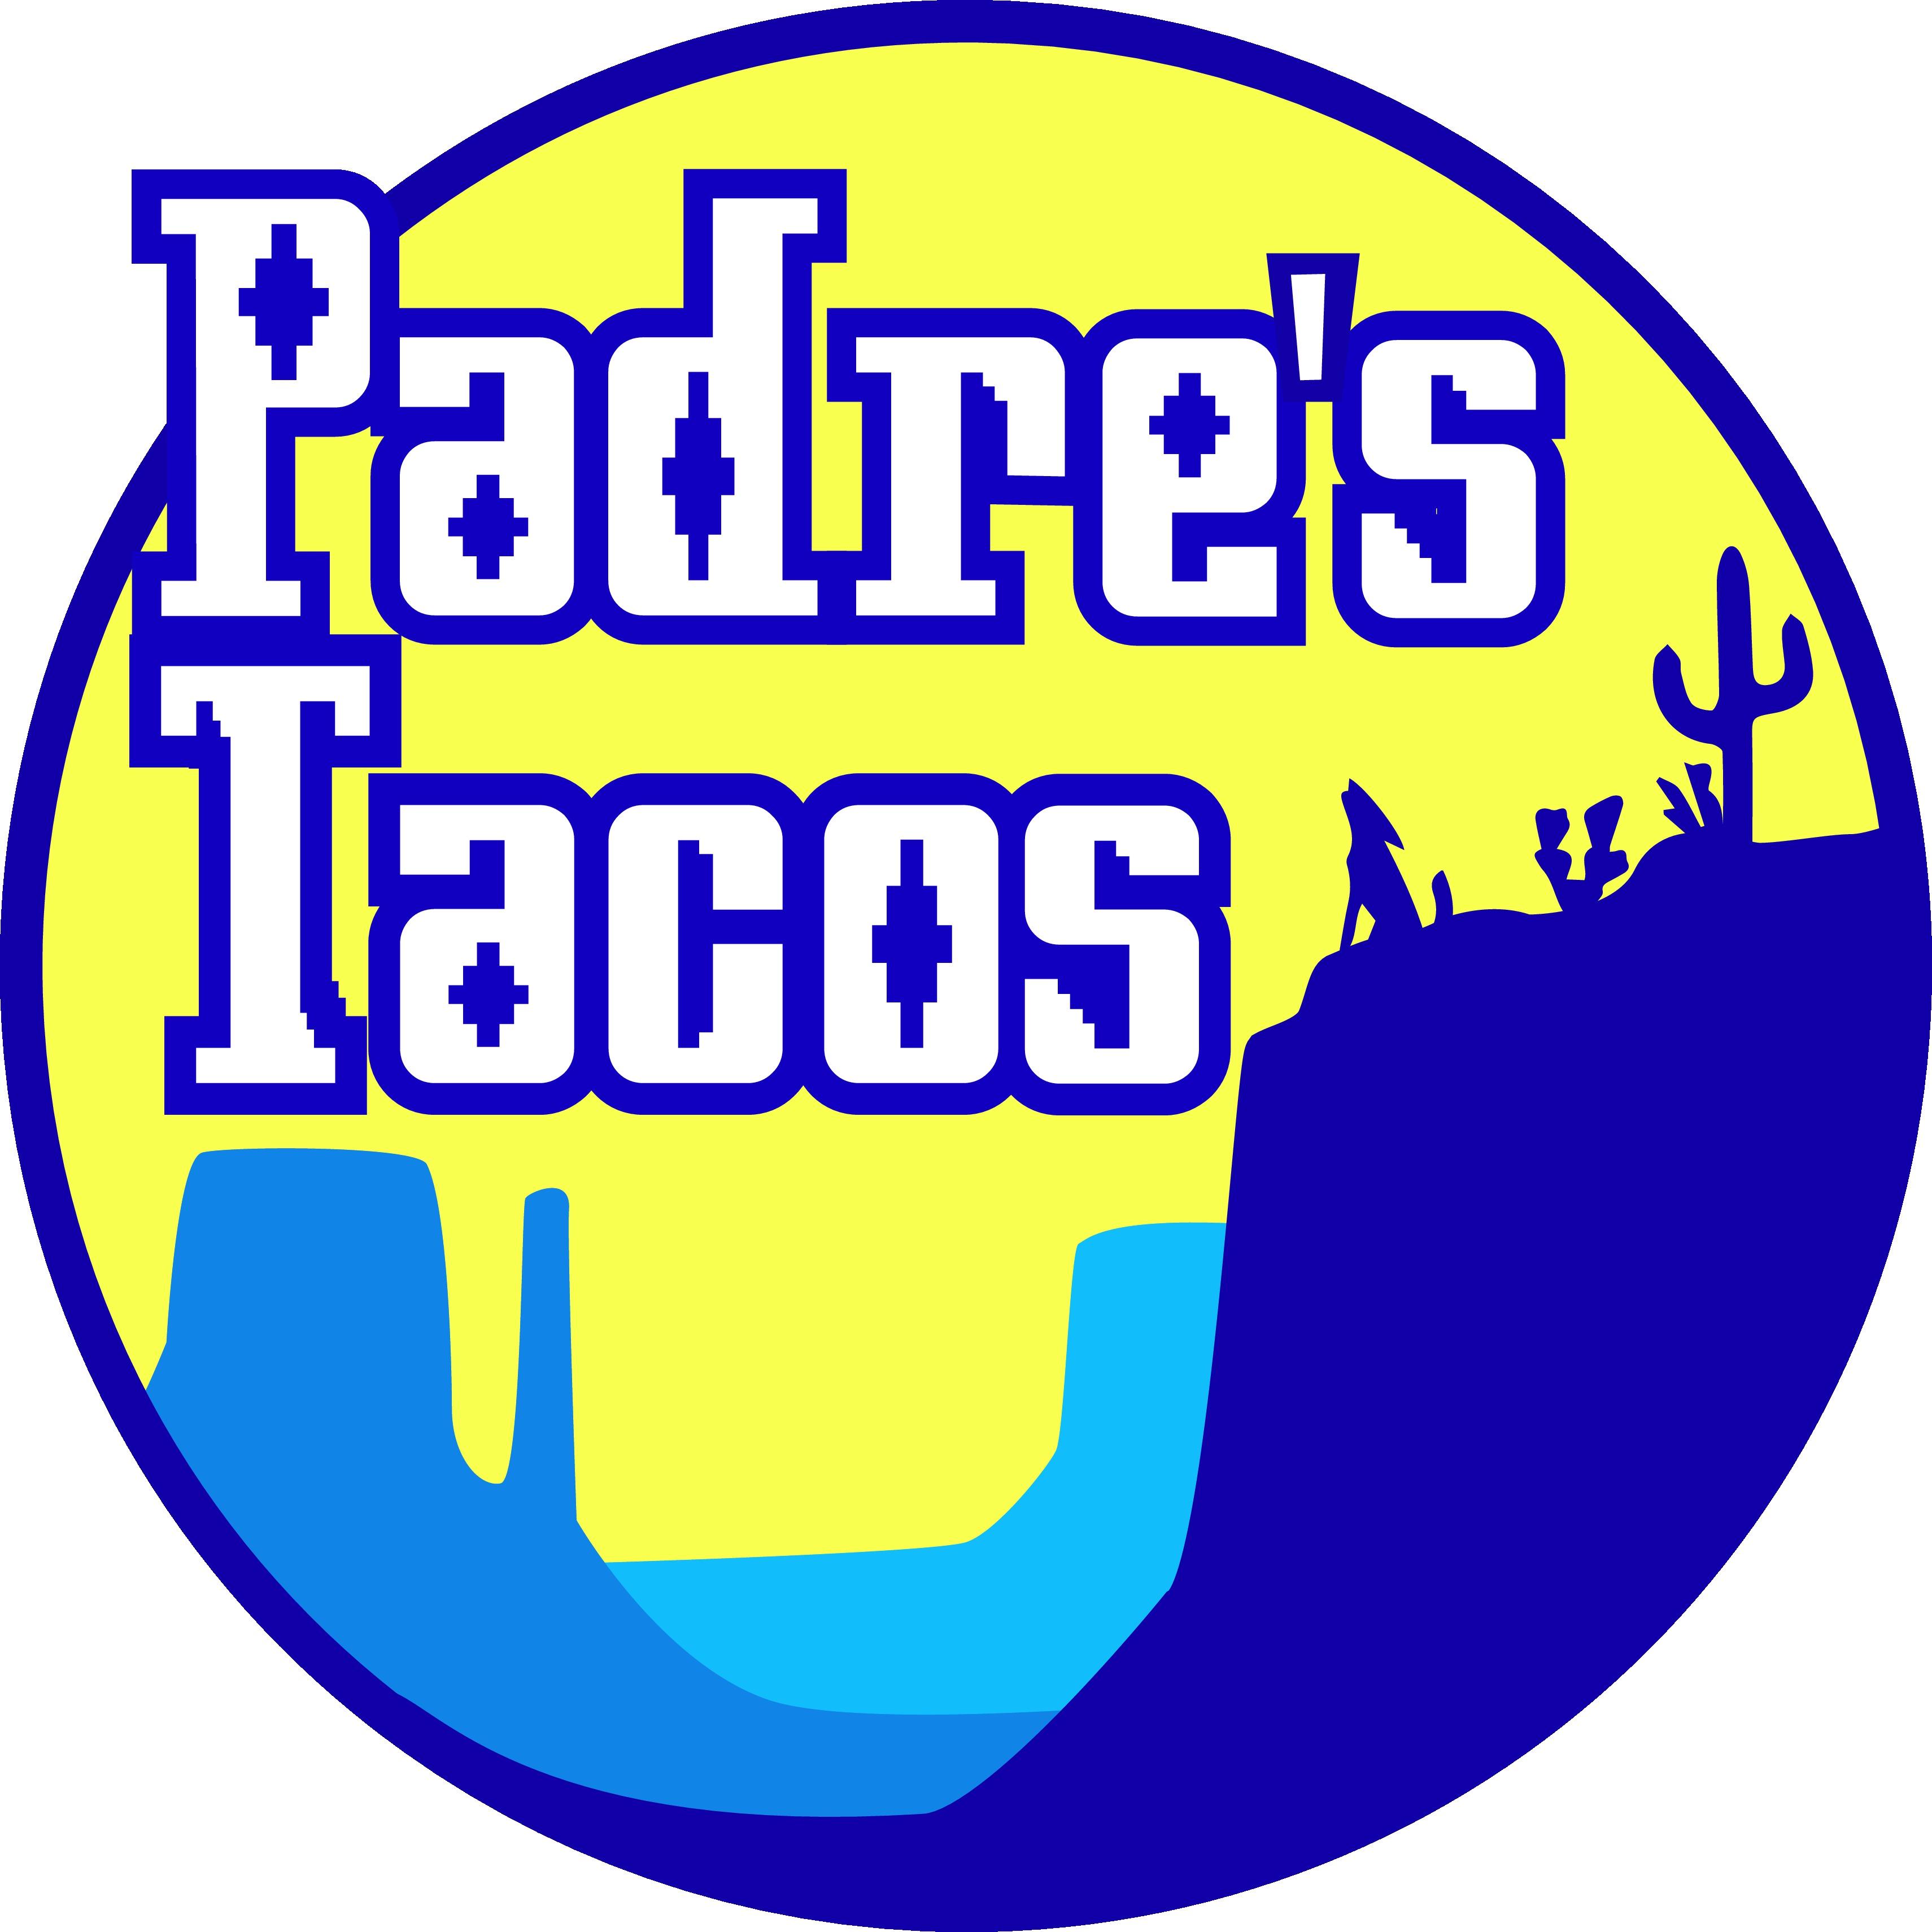 Padres Tacos